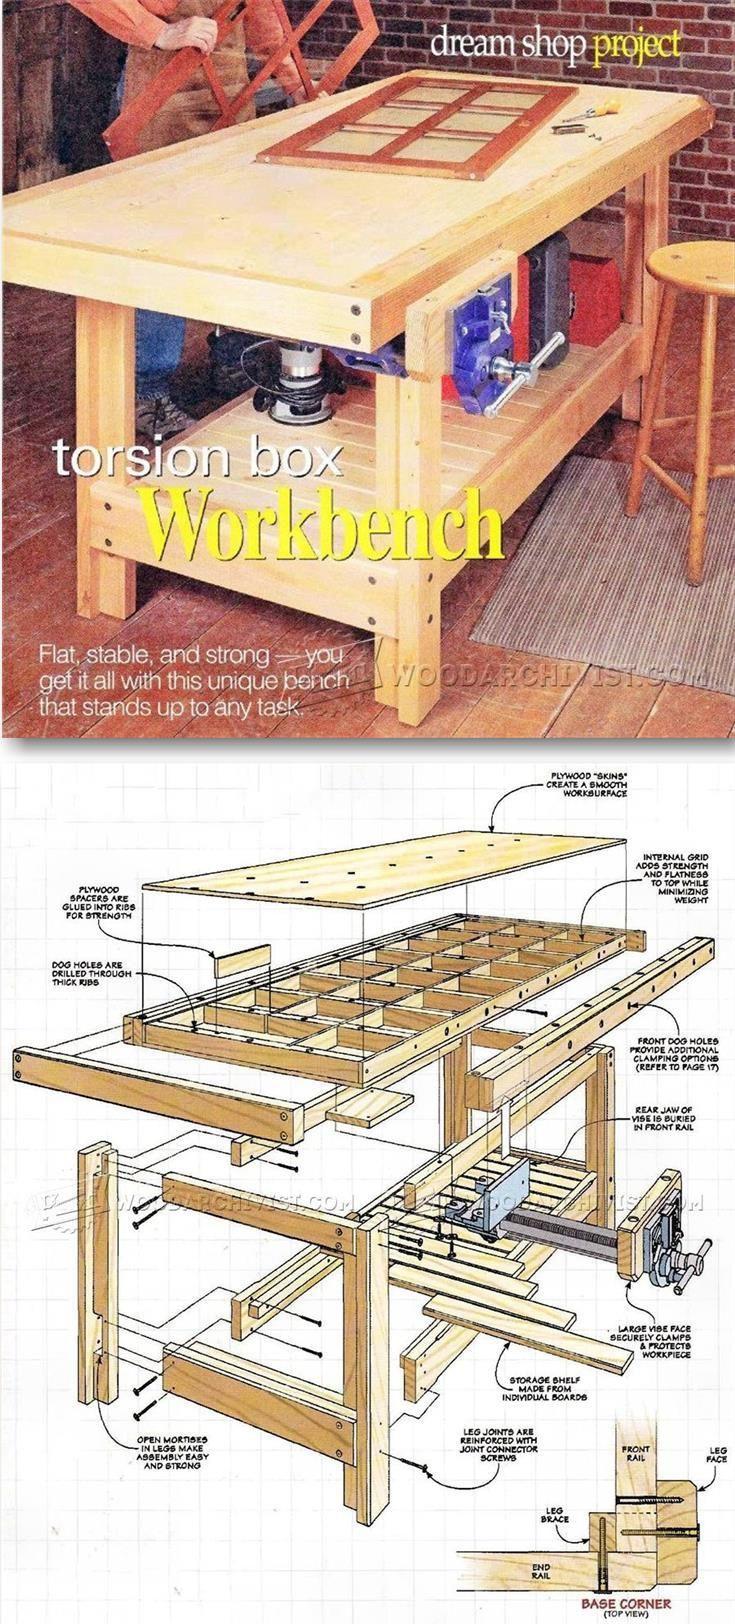 Torsion Box Workbench Plans - Workshop Solutions Plans, Tips and Tricks | WoodArchivist.com